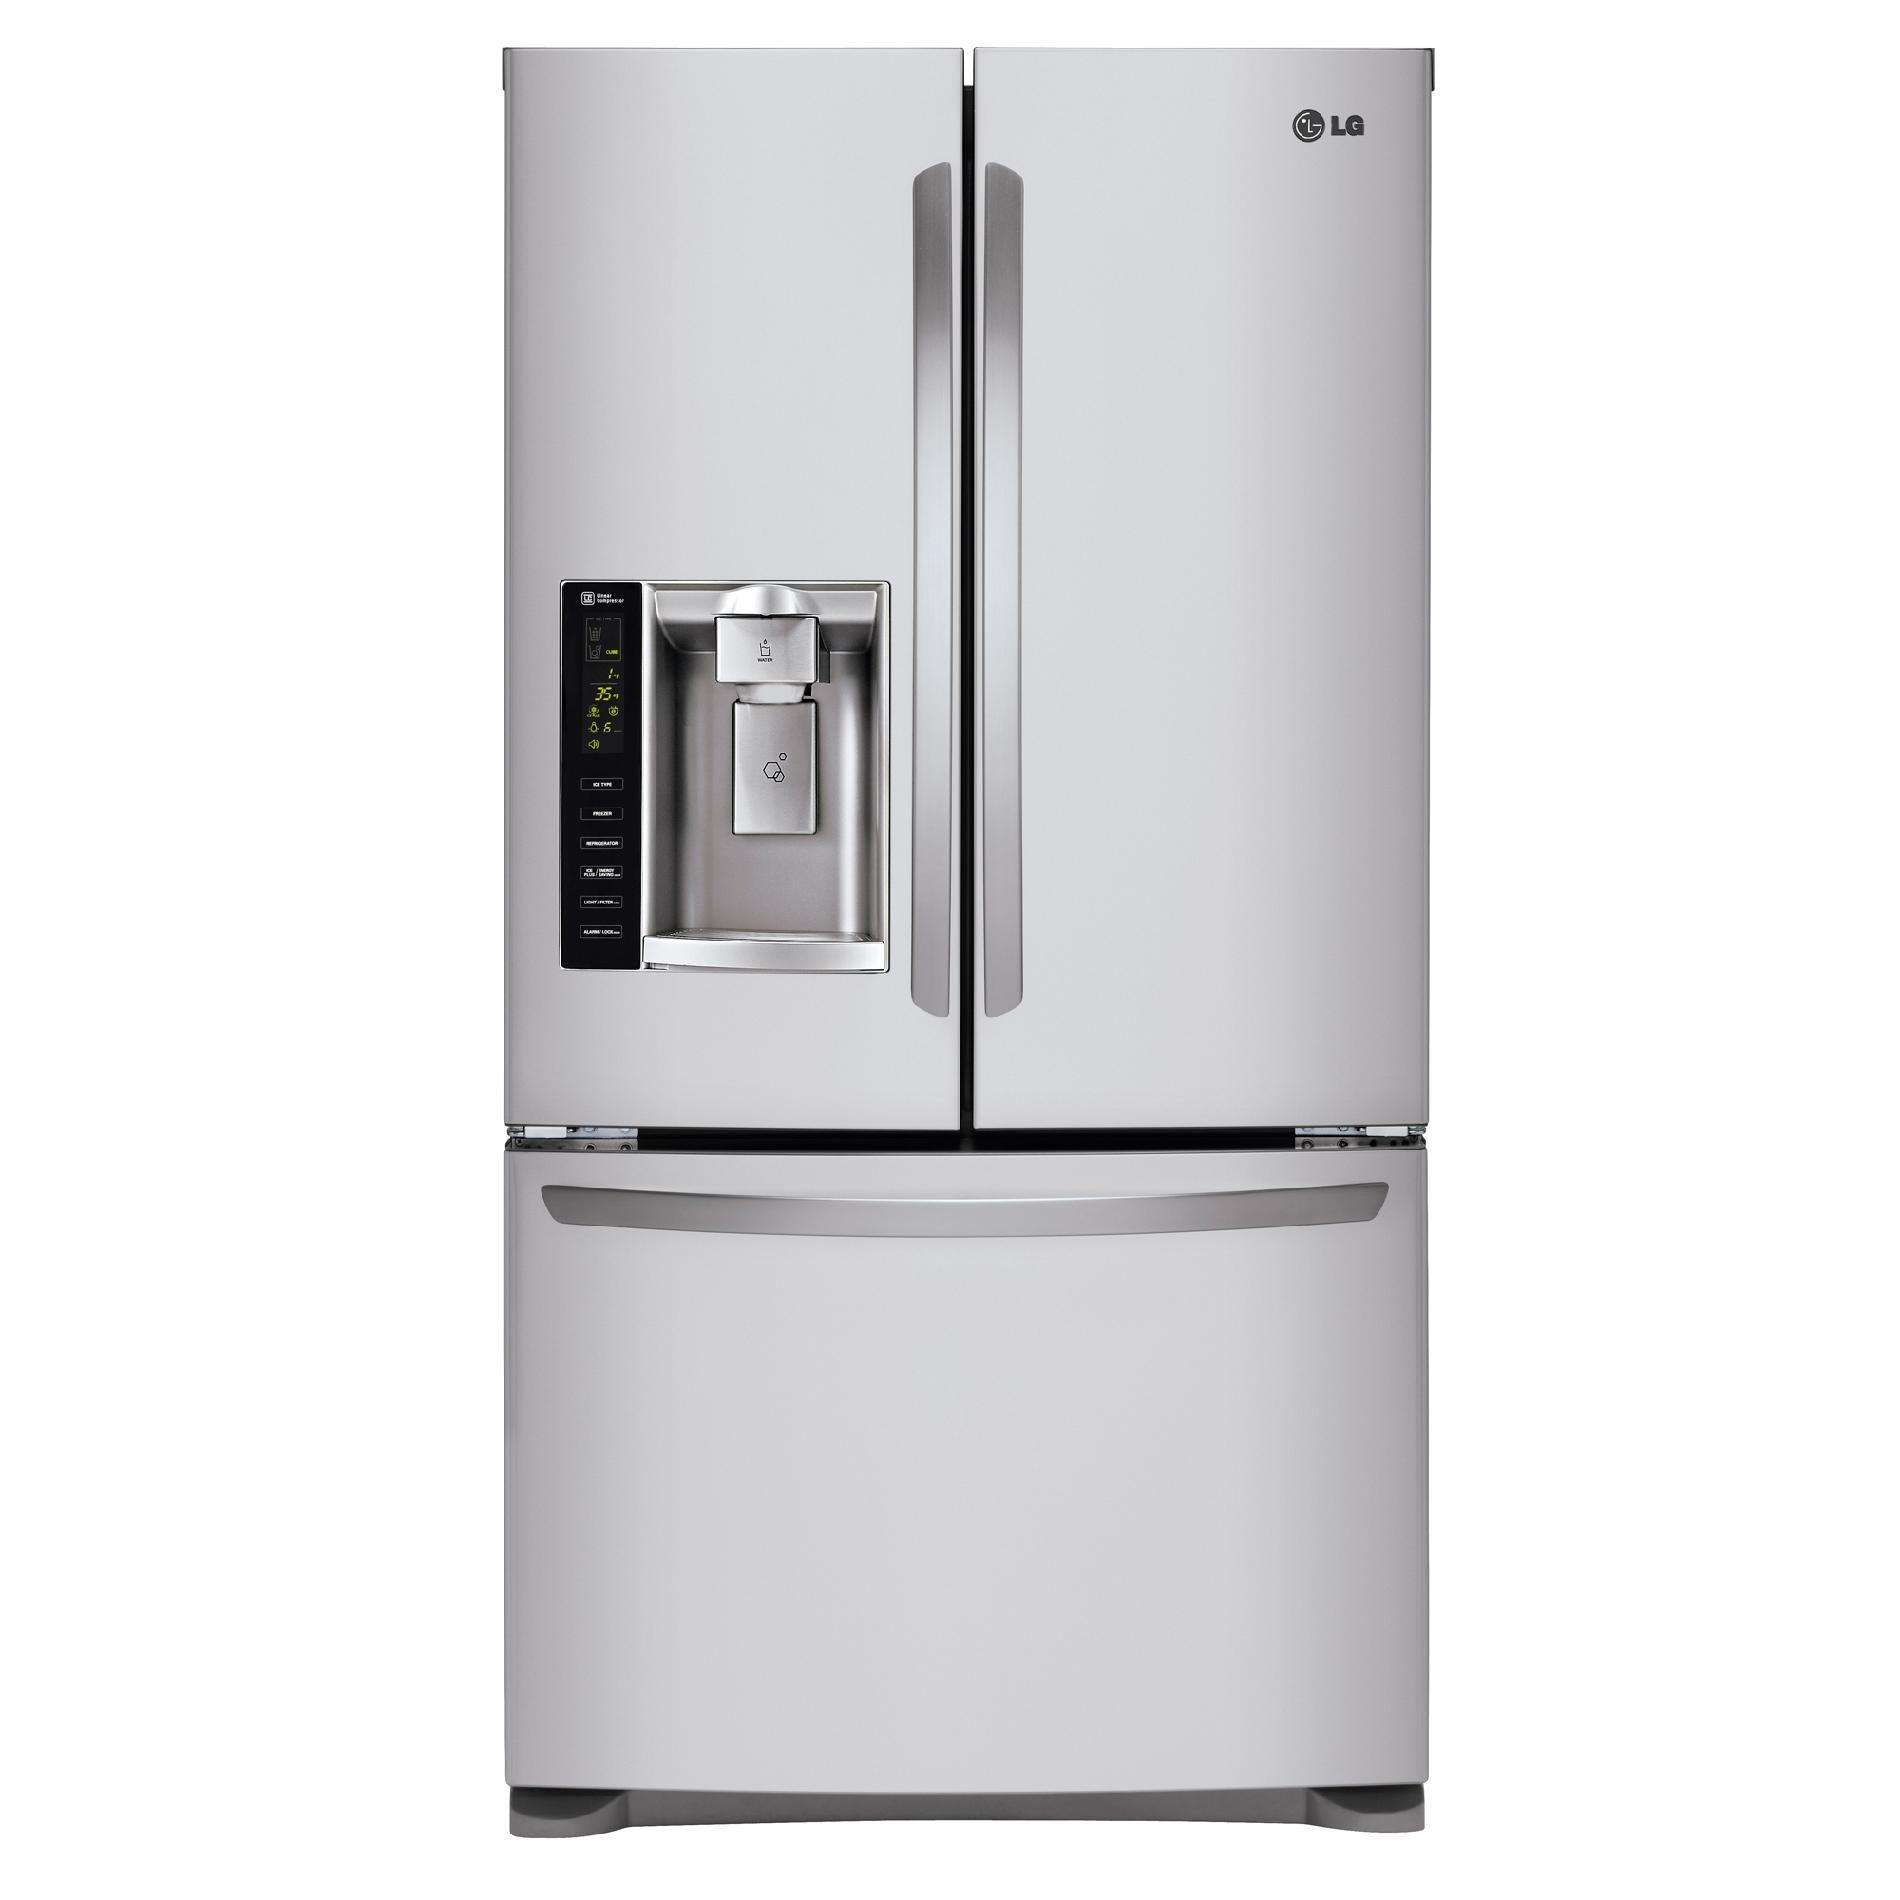 Genial French Door Bottom Freezer Refrigerator